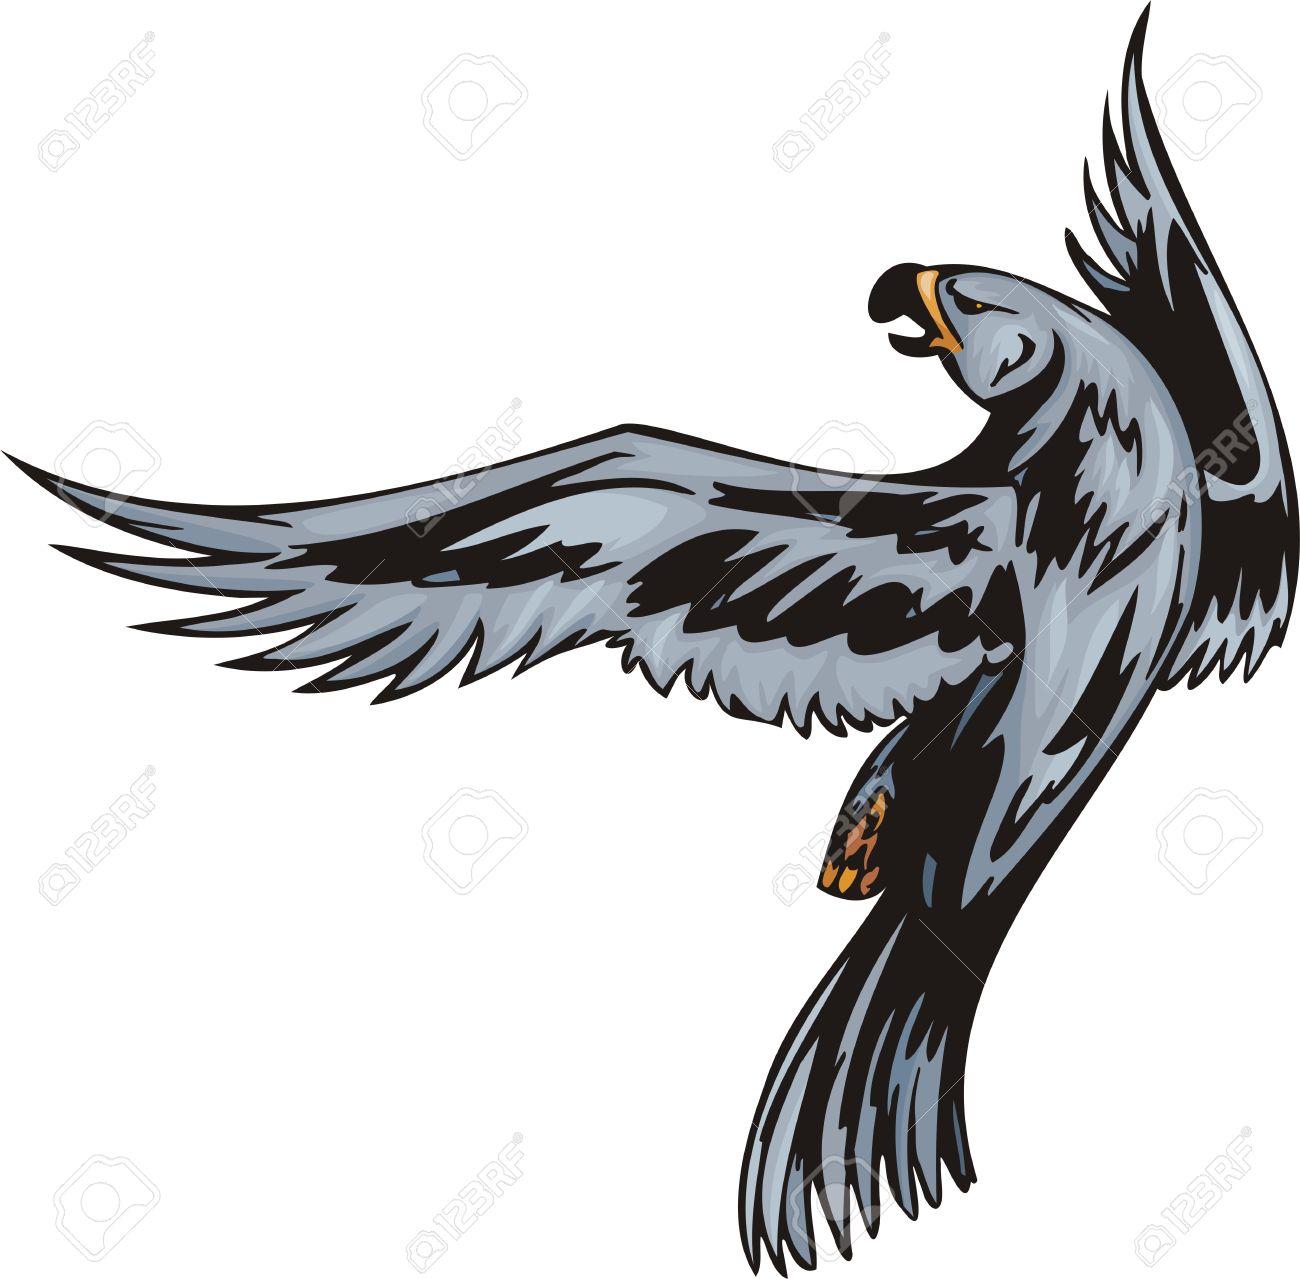 Eagle With Dark Blue Plumage. Predatory Birds. Illustration.